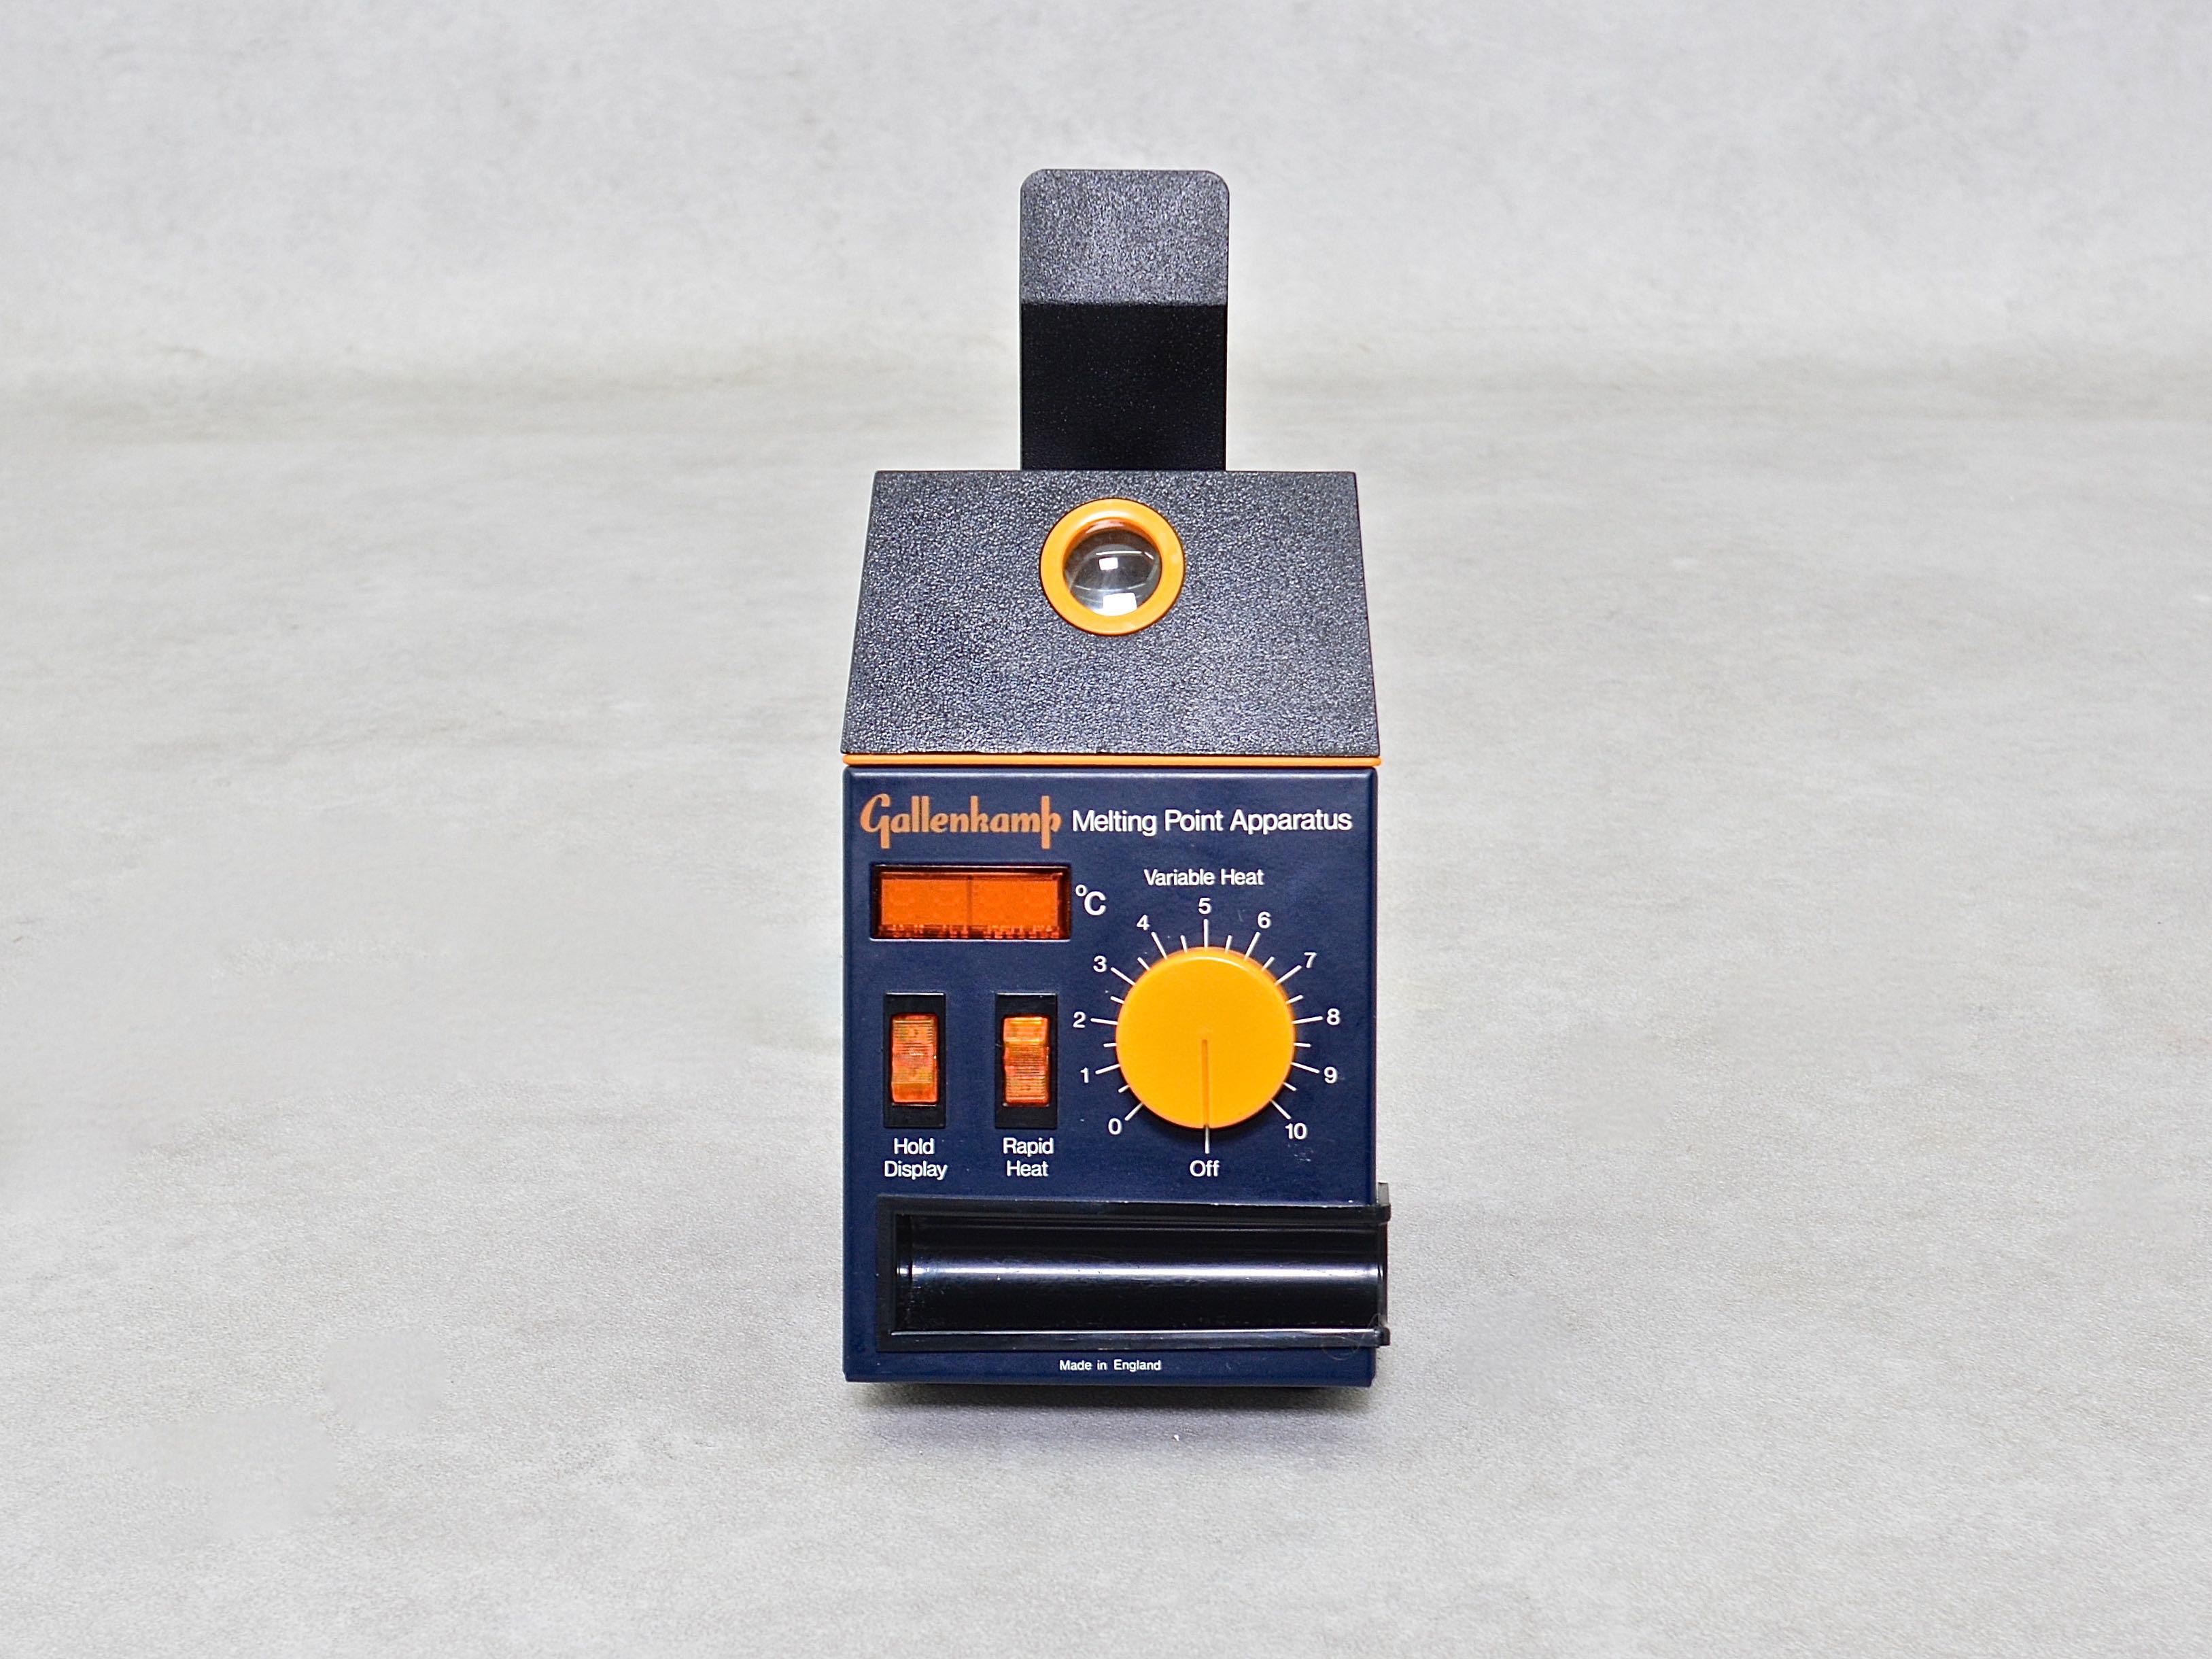 Gallenkamp Melting Point Apparatus - Gemini BV